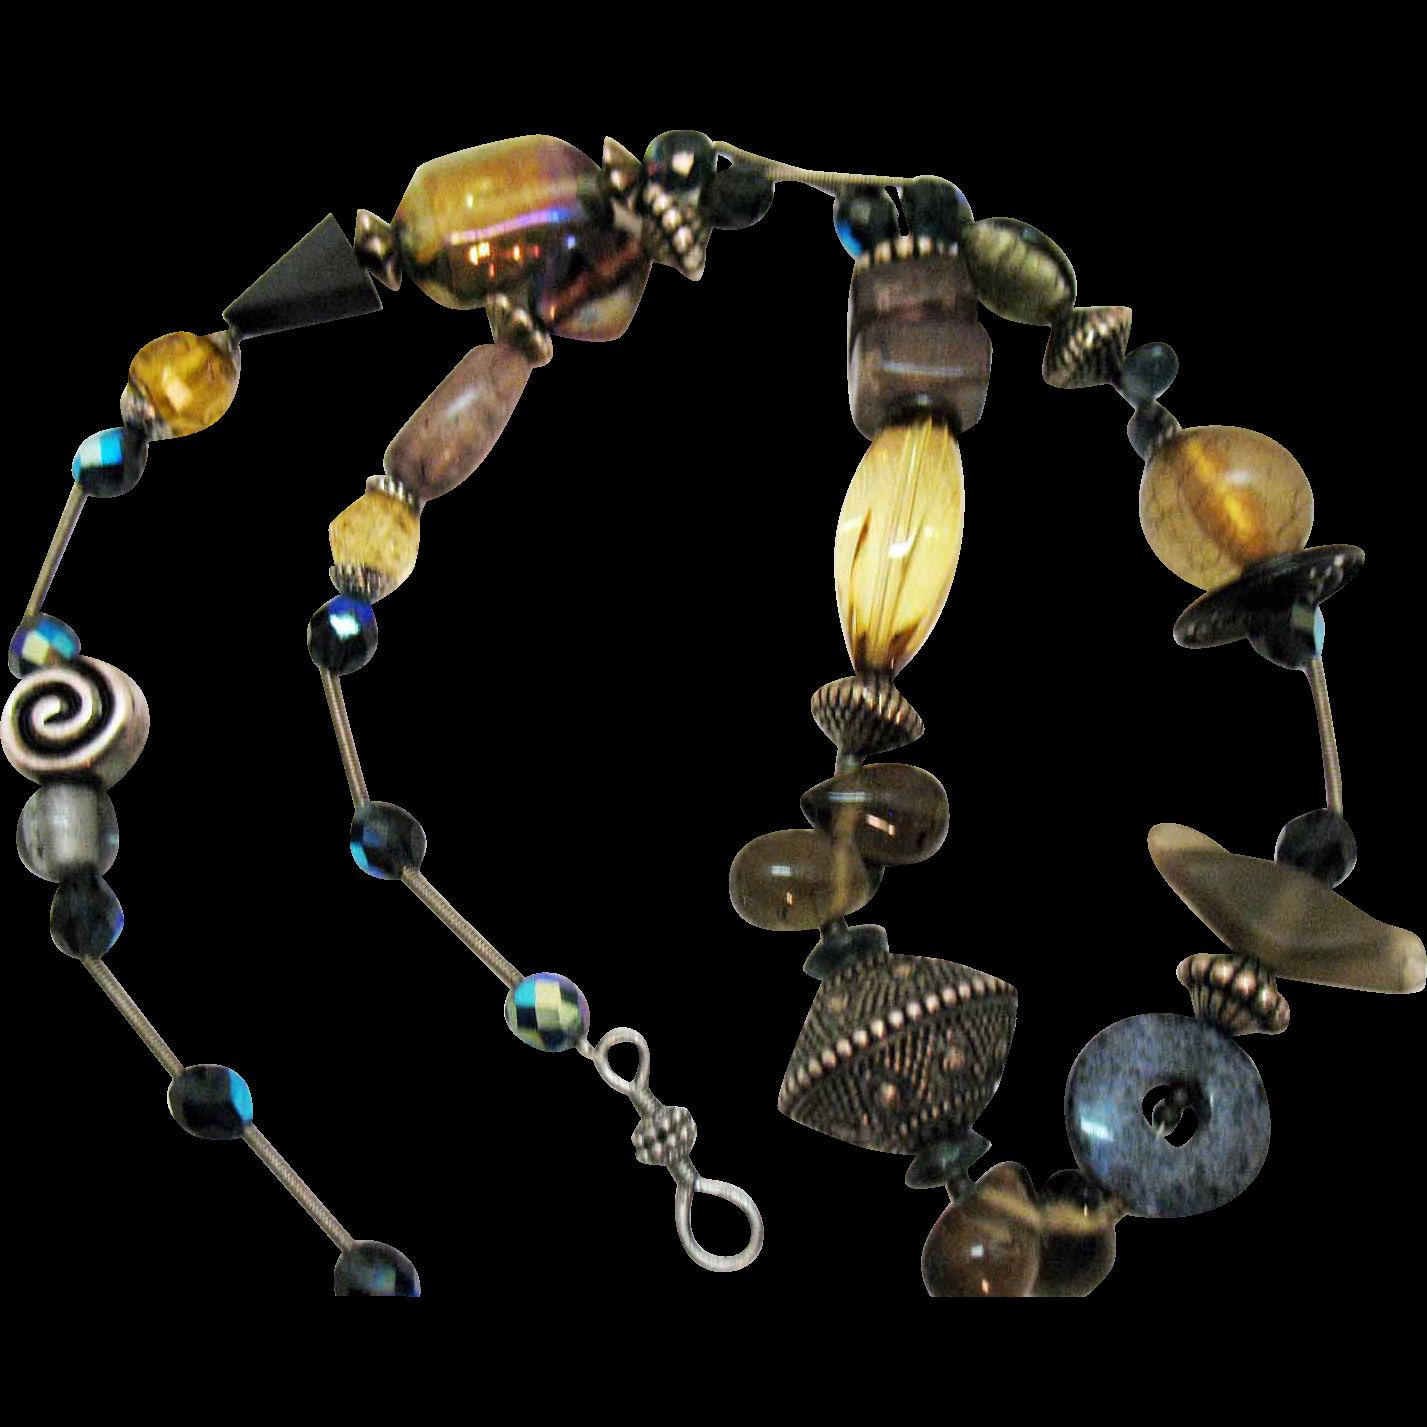 Unusual Signed Treska Vintage Eclectic Beaded Necklace